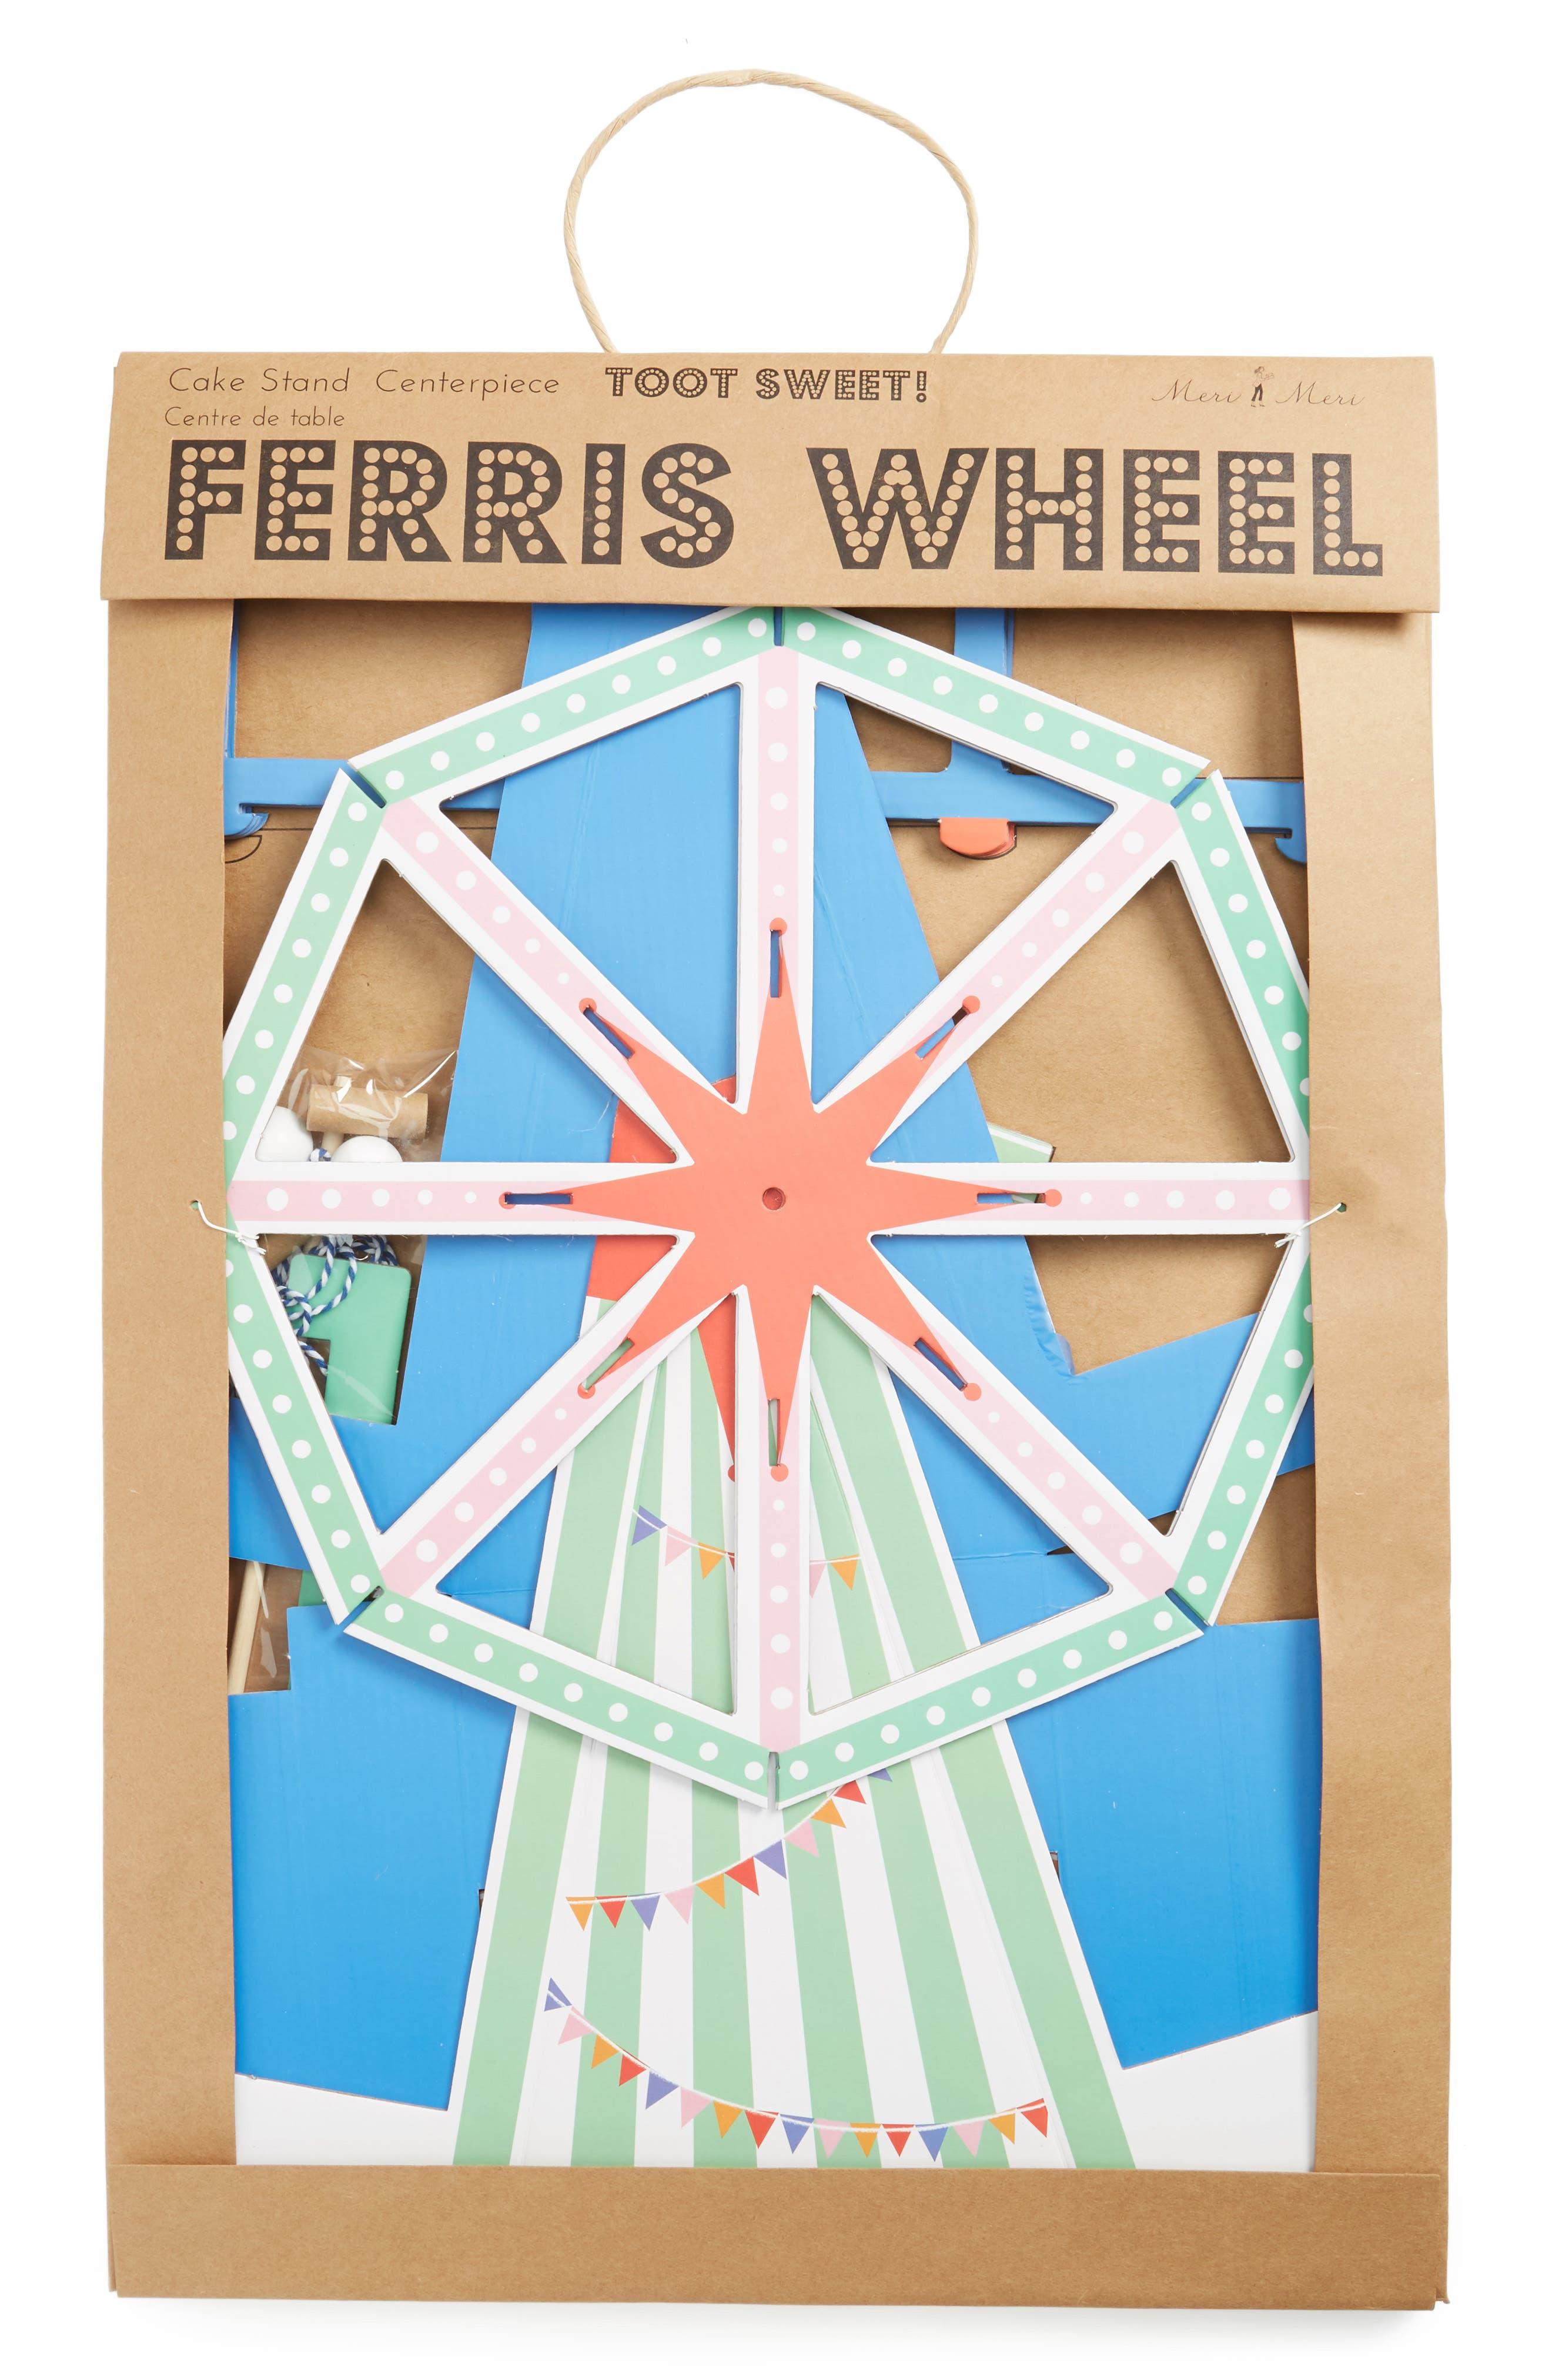 Toot Sweet - Ferris Wheel Cupcake Centerpiece,                             Main thumbnail 1, color,                             Blue Multi